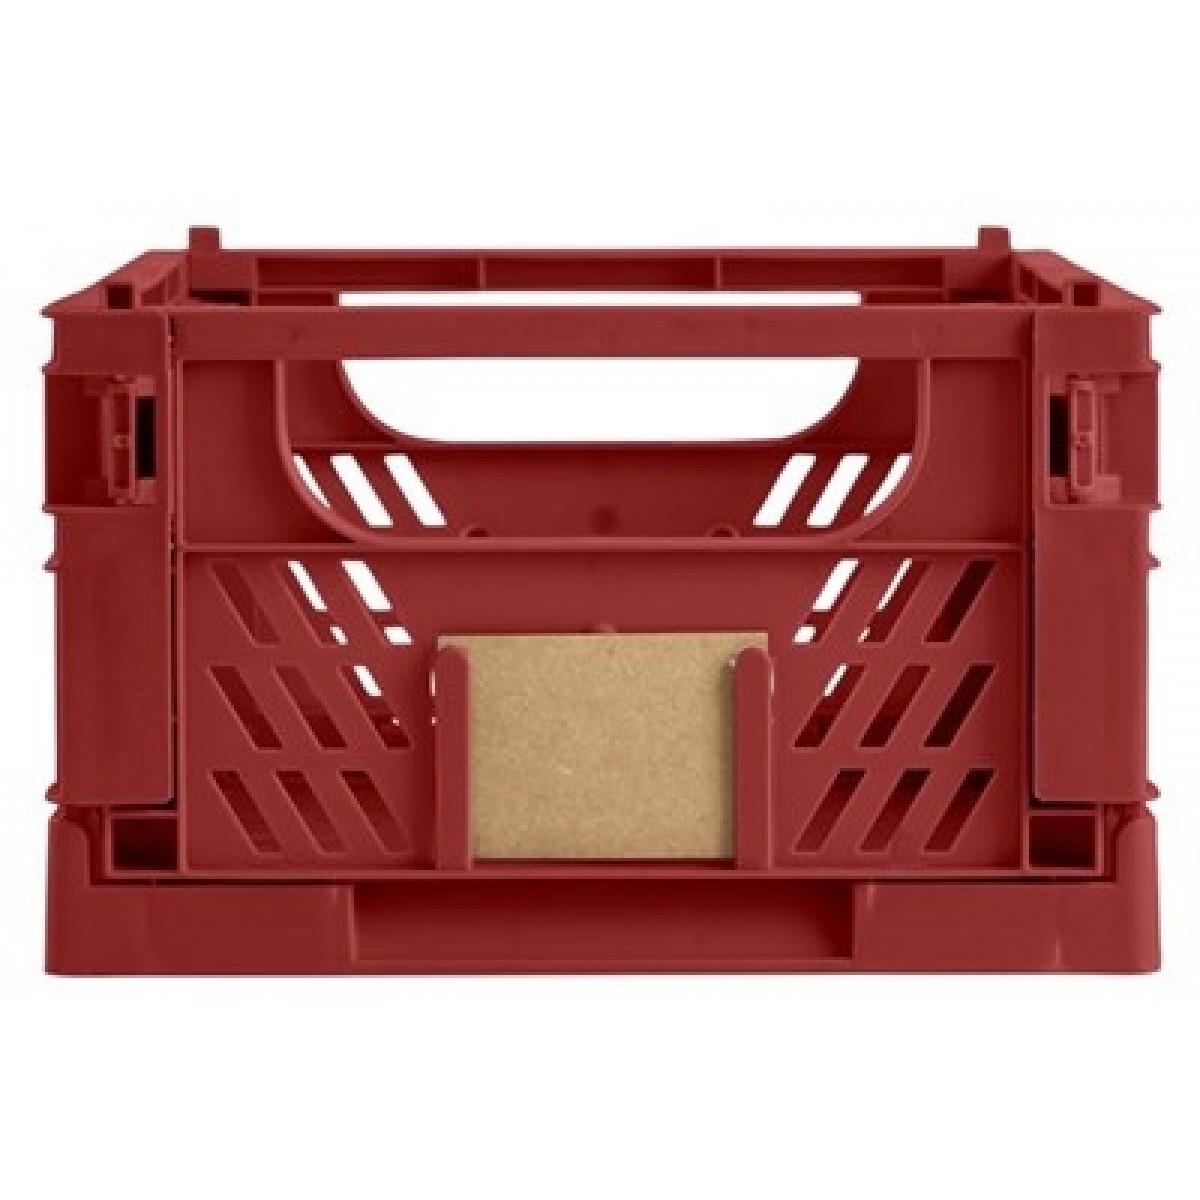 DAY Opbevaringskasse foldbar 33x24,5x15 cm ochre red